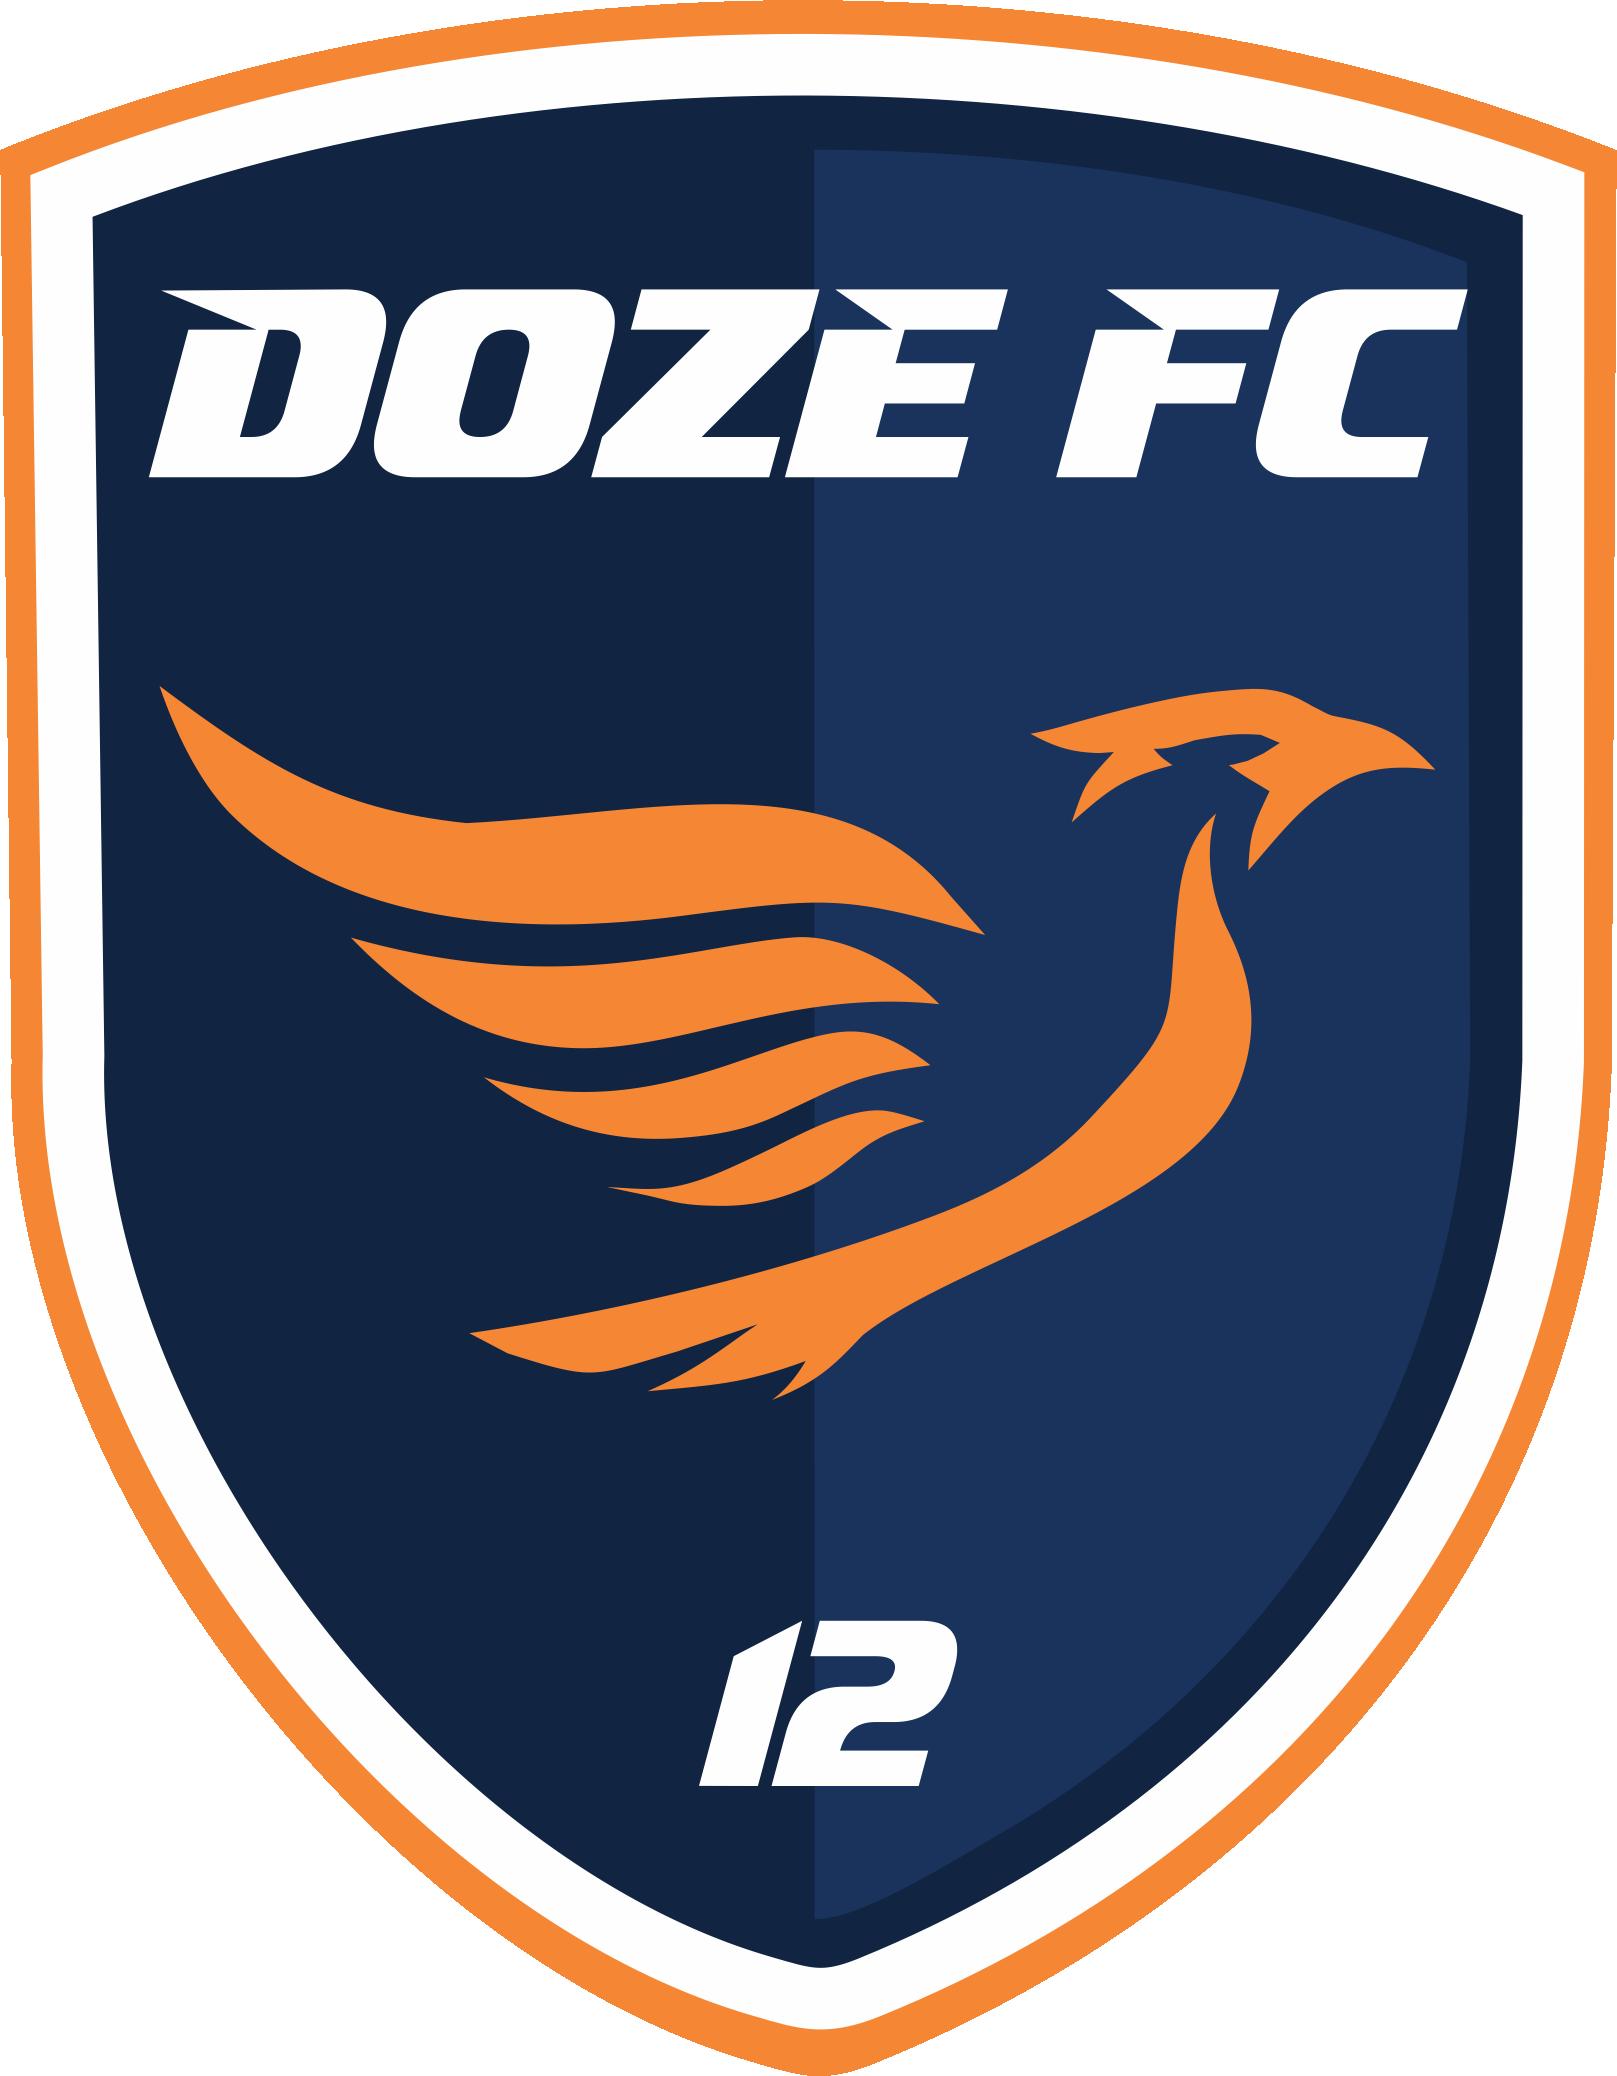 Doze Futebol Clube (Vitória (ES) b246c79c315d1